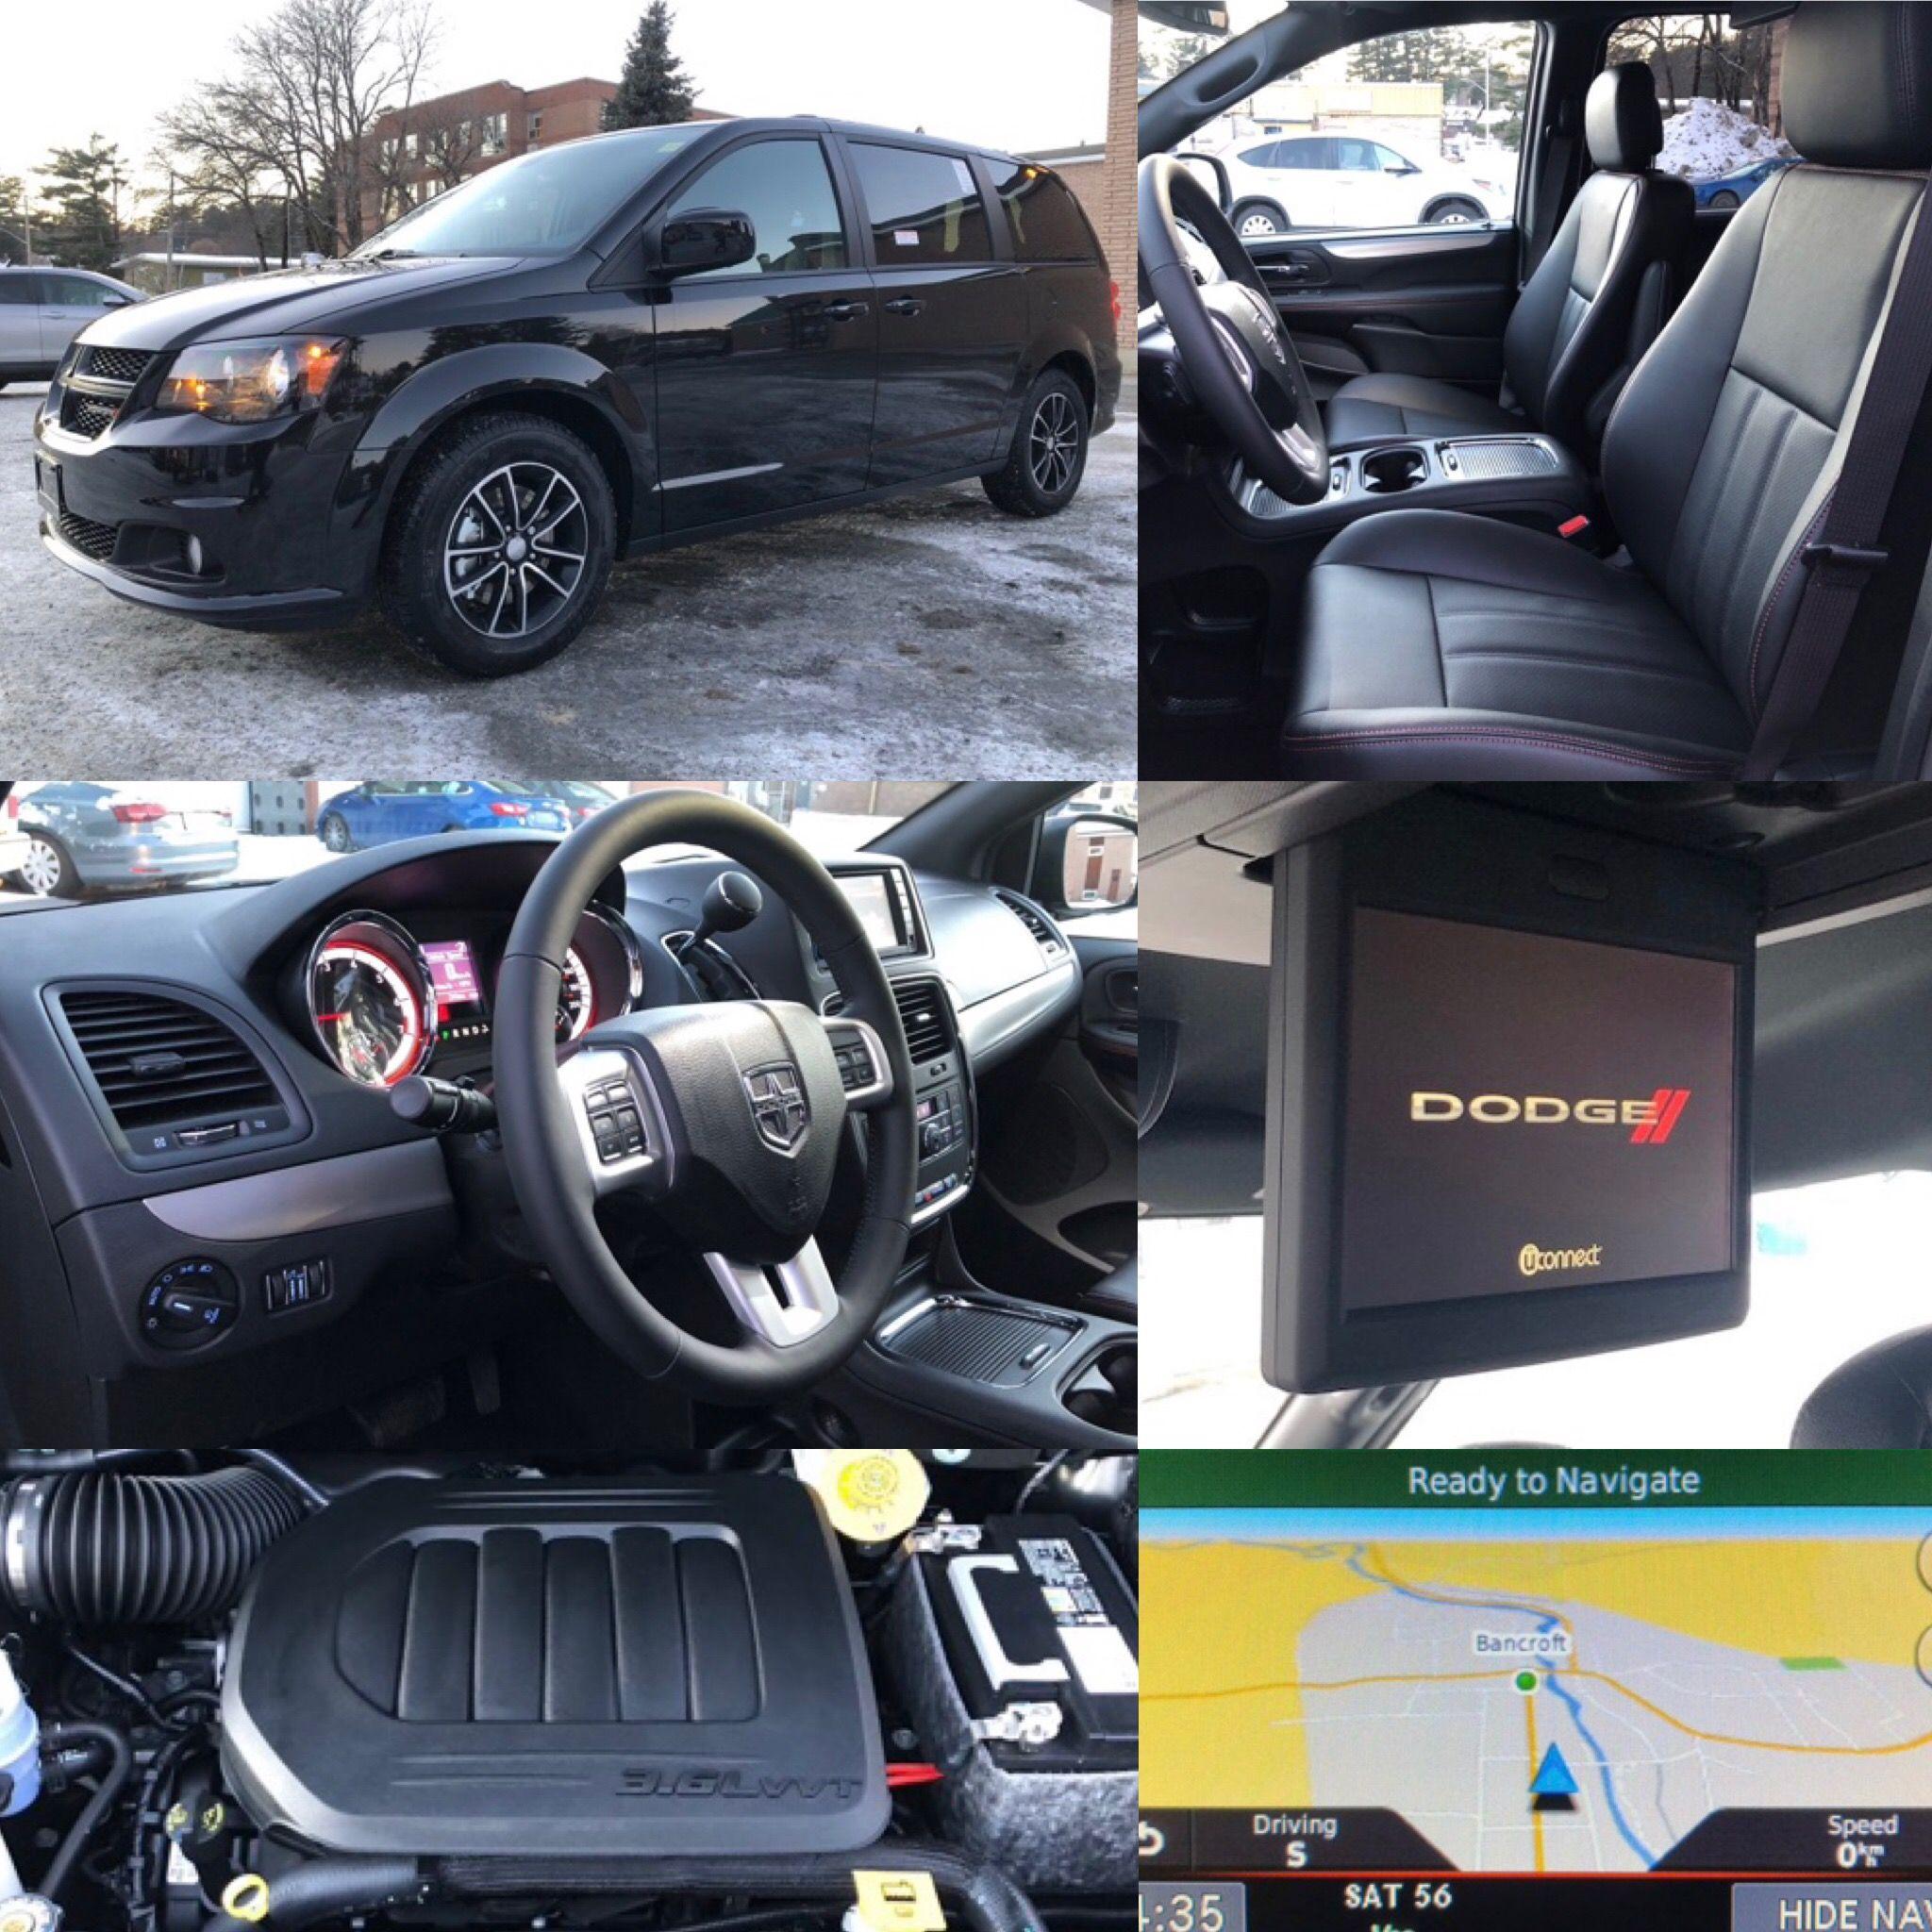 2019 'Brilliant Black Crystal' Dodge Grand Caravan GT. NAV